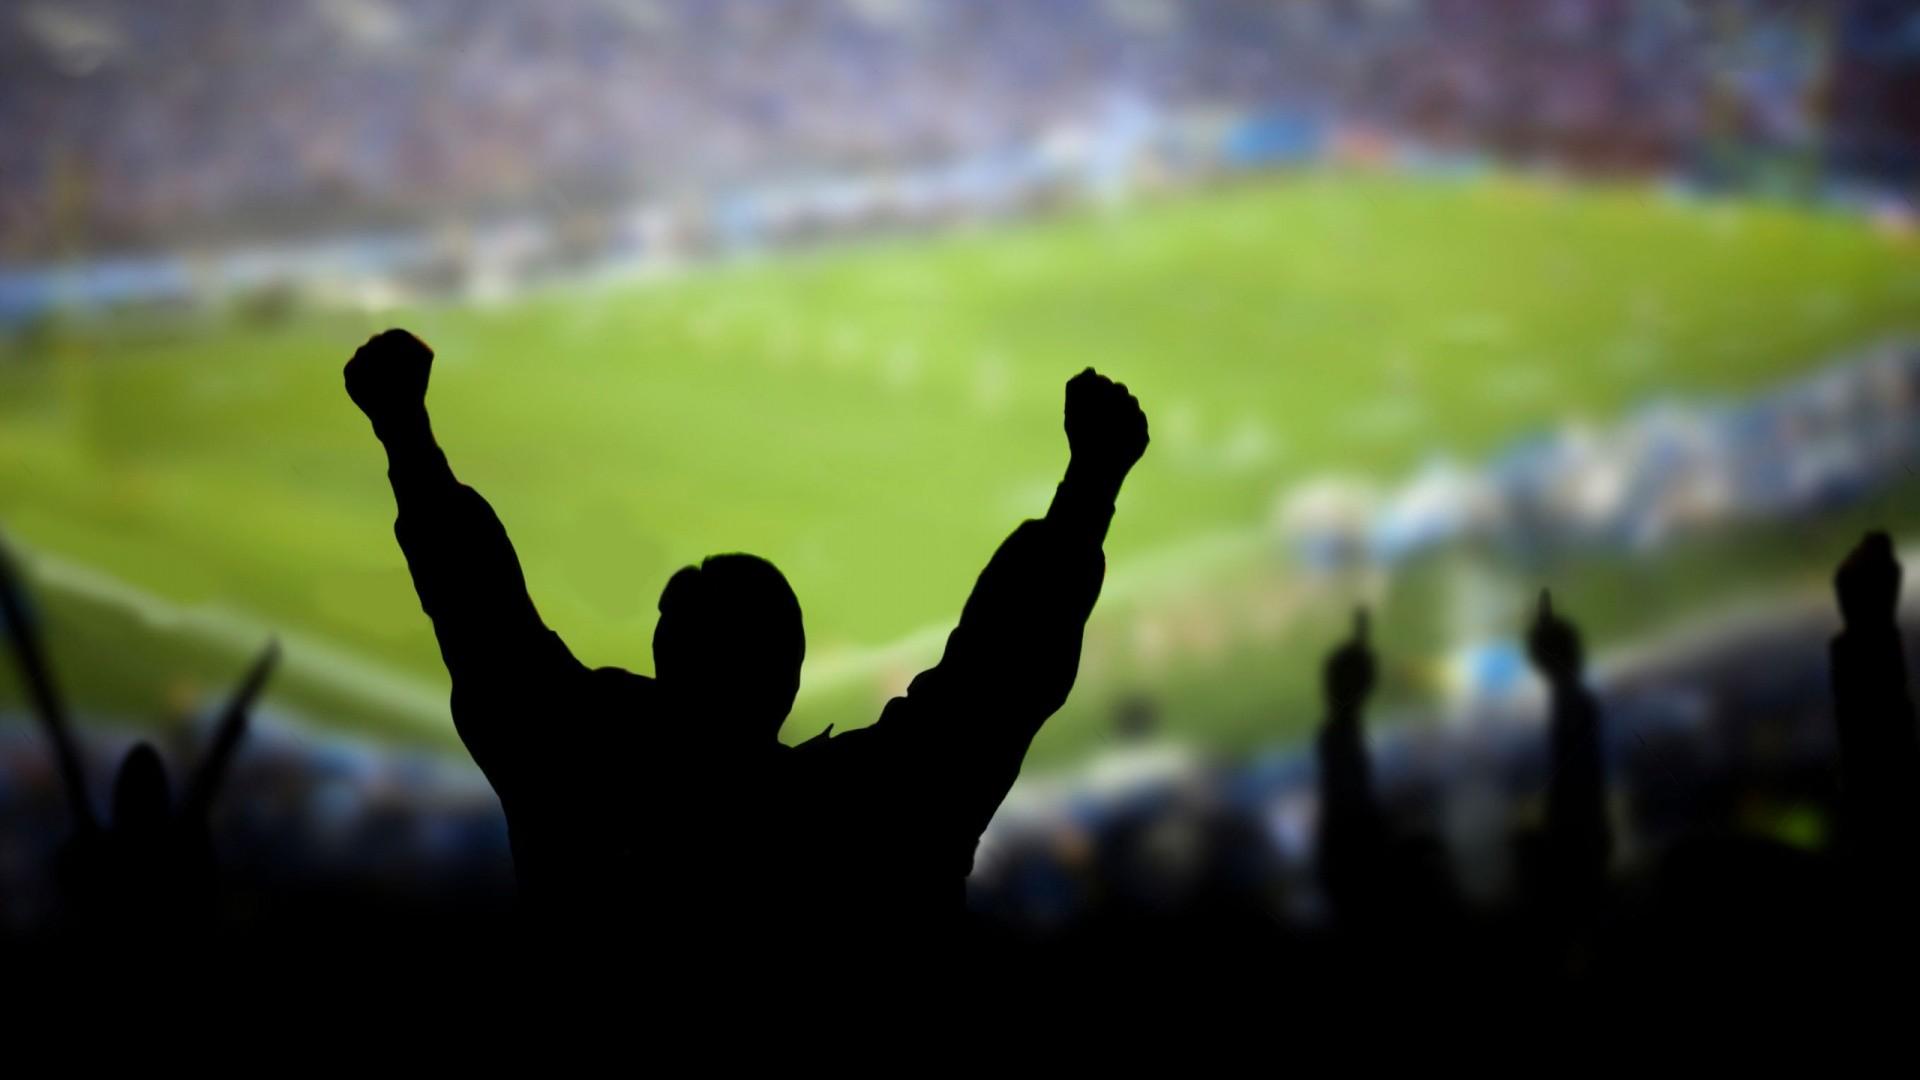 Cool Football Iphone Wallpapers: Description: Fan Soccer Wallpaper is .